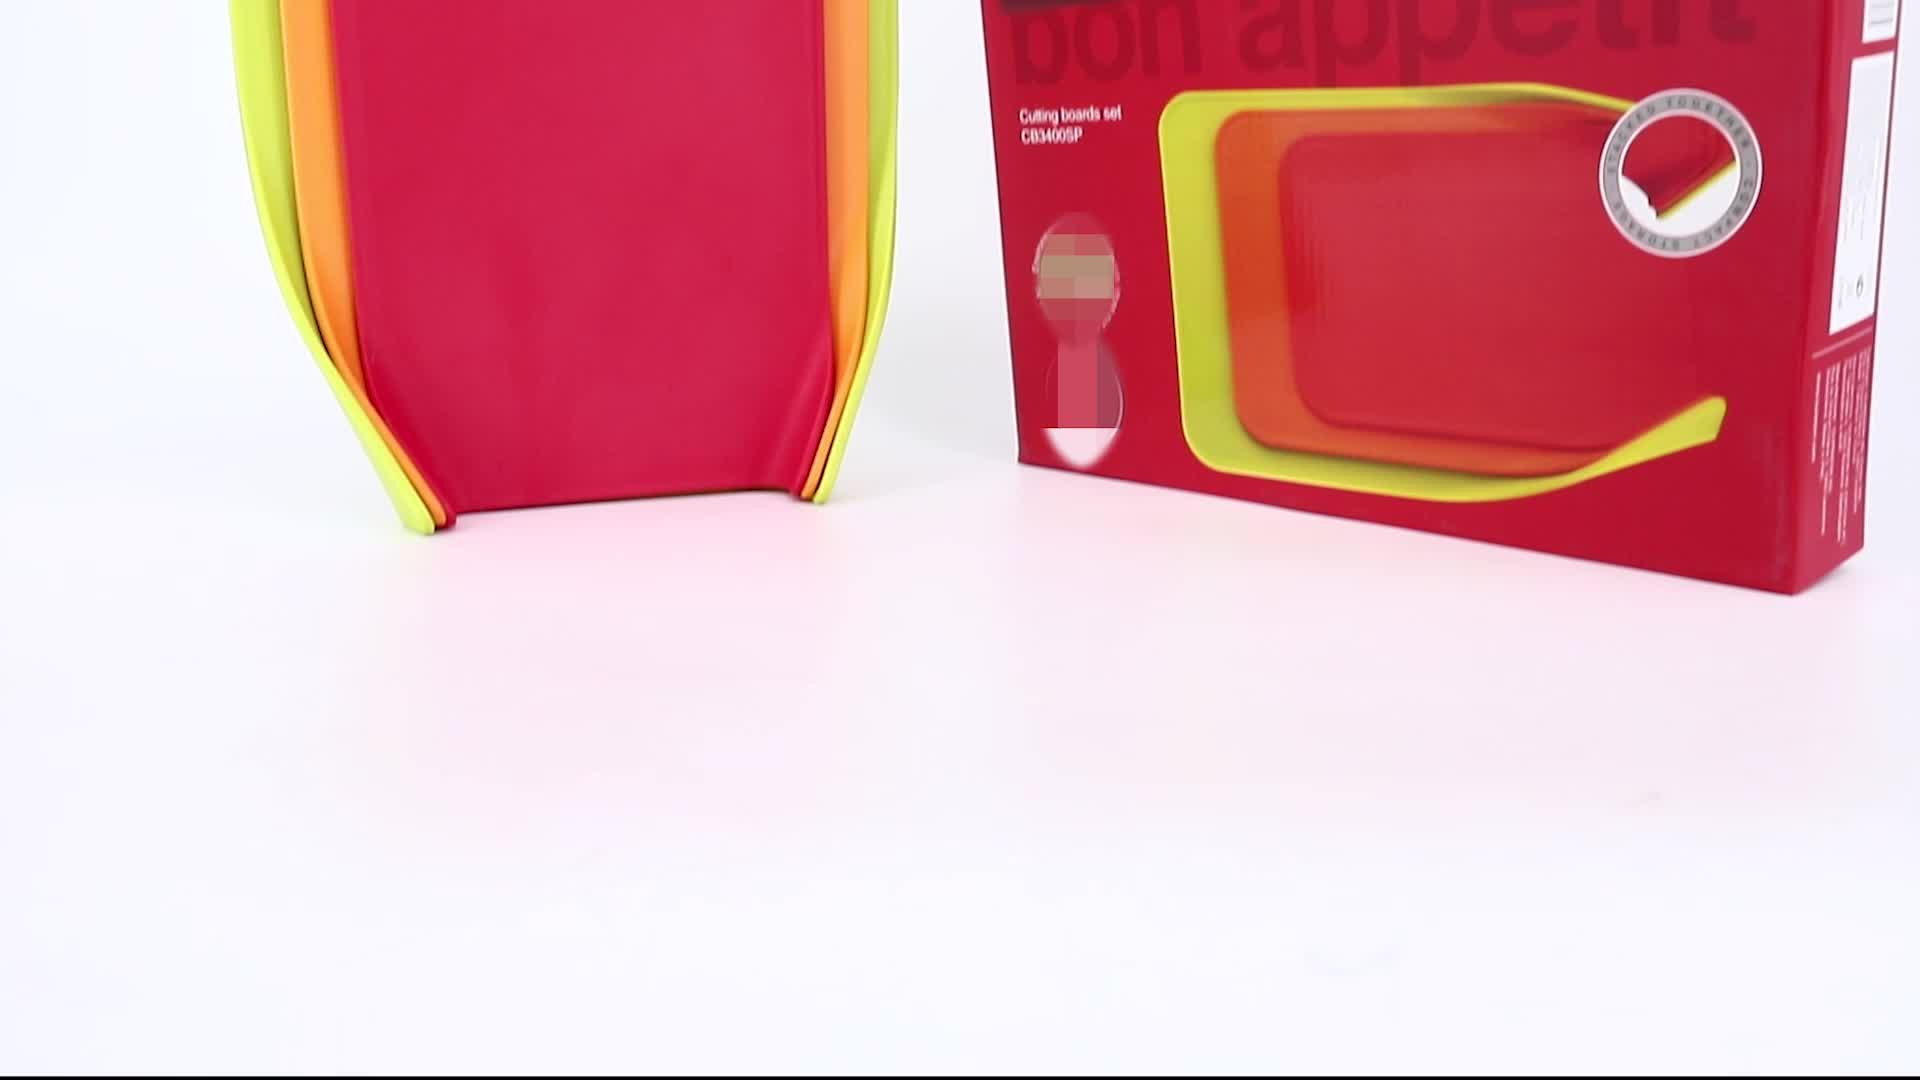 Accesorios Para Muebles 드 Cocina 도마 세트 비 슬립 유연한 플라스틱 3 조각 접이식 컬러 도마 세트